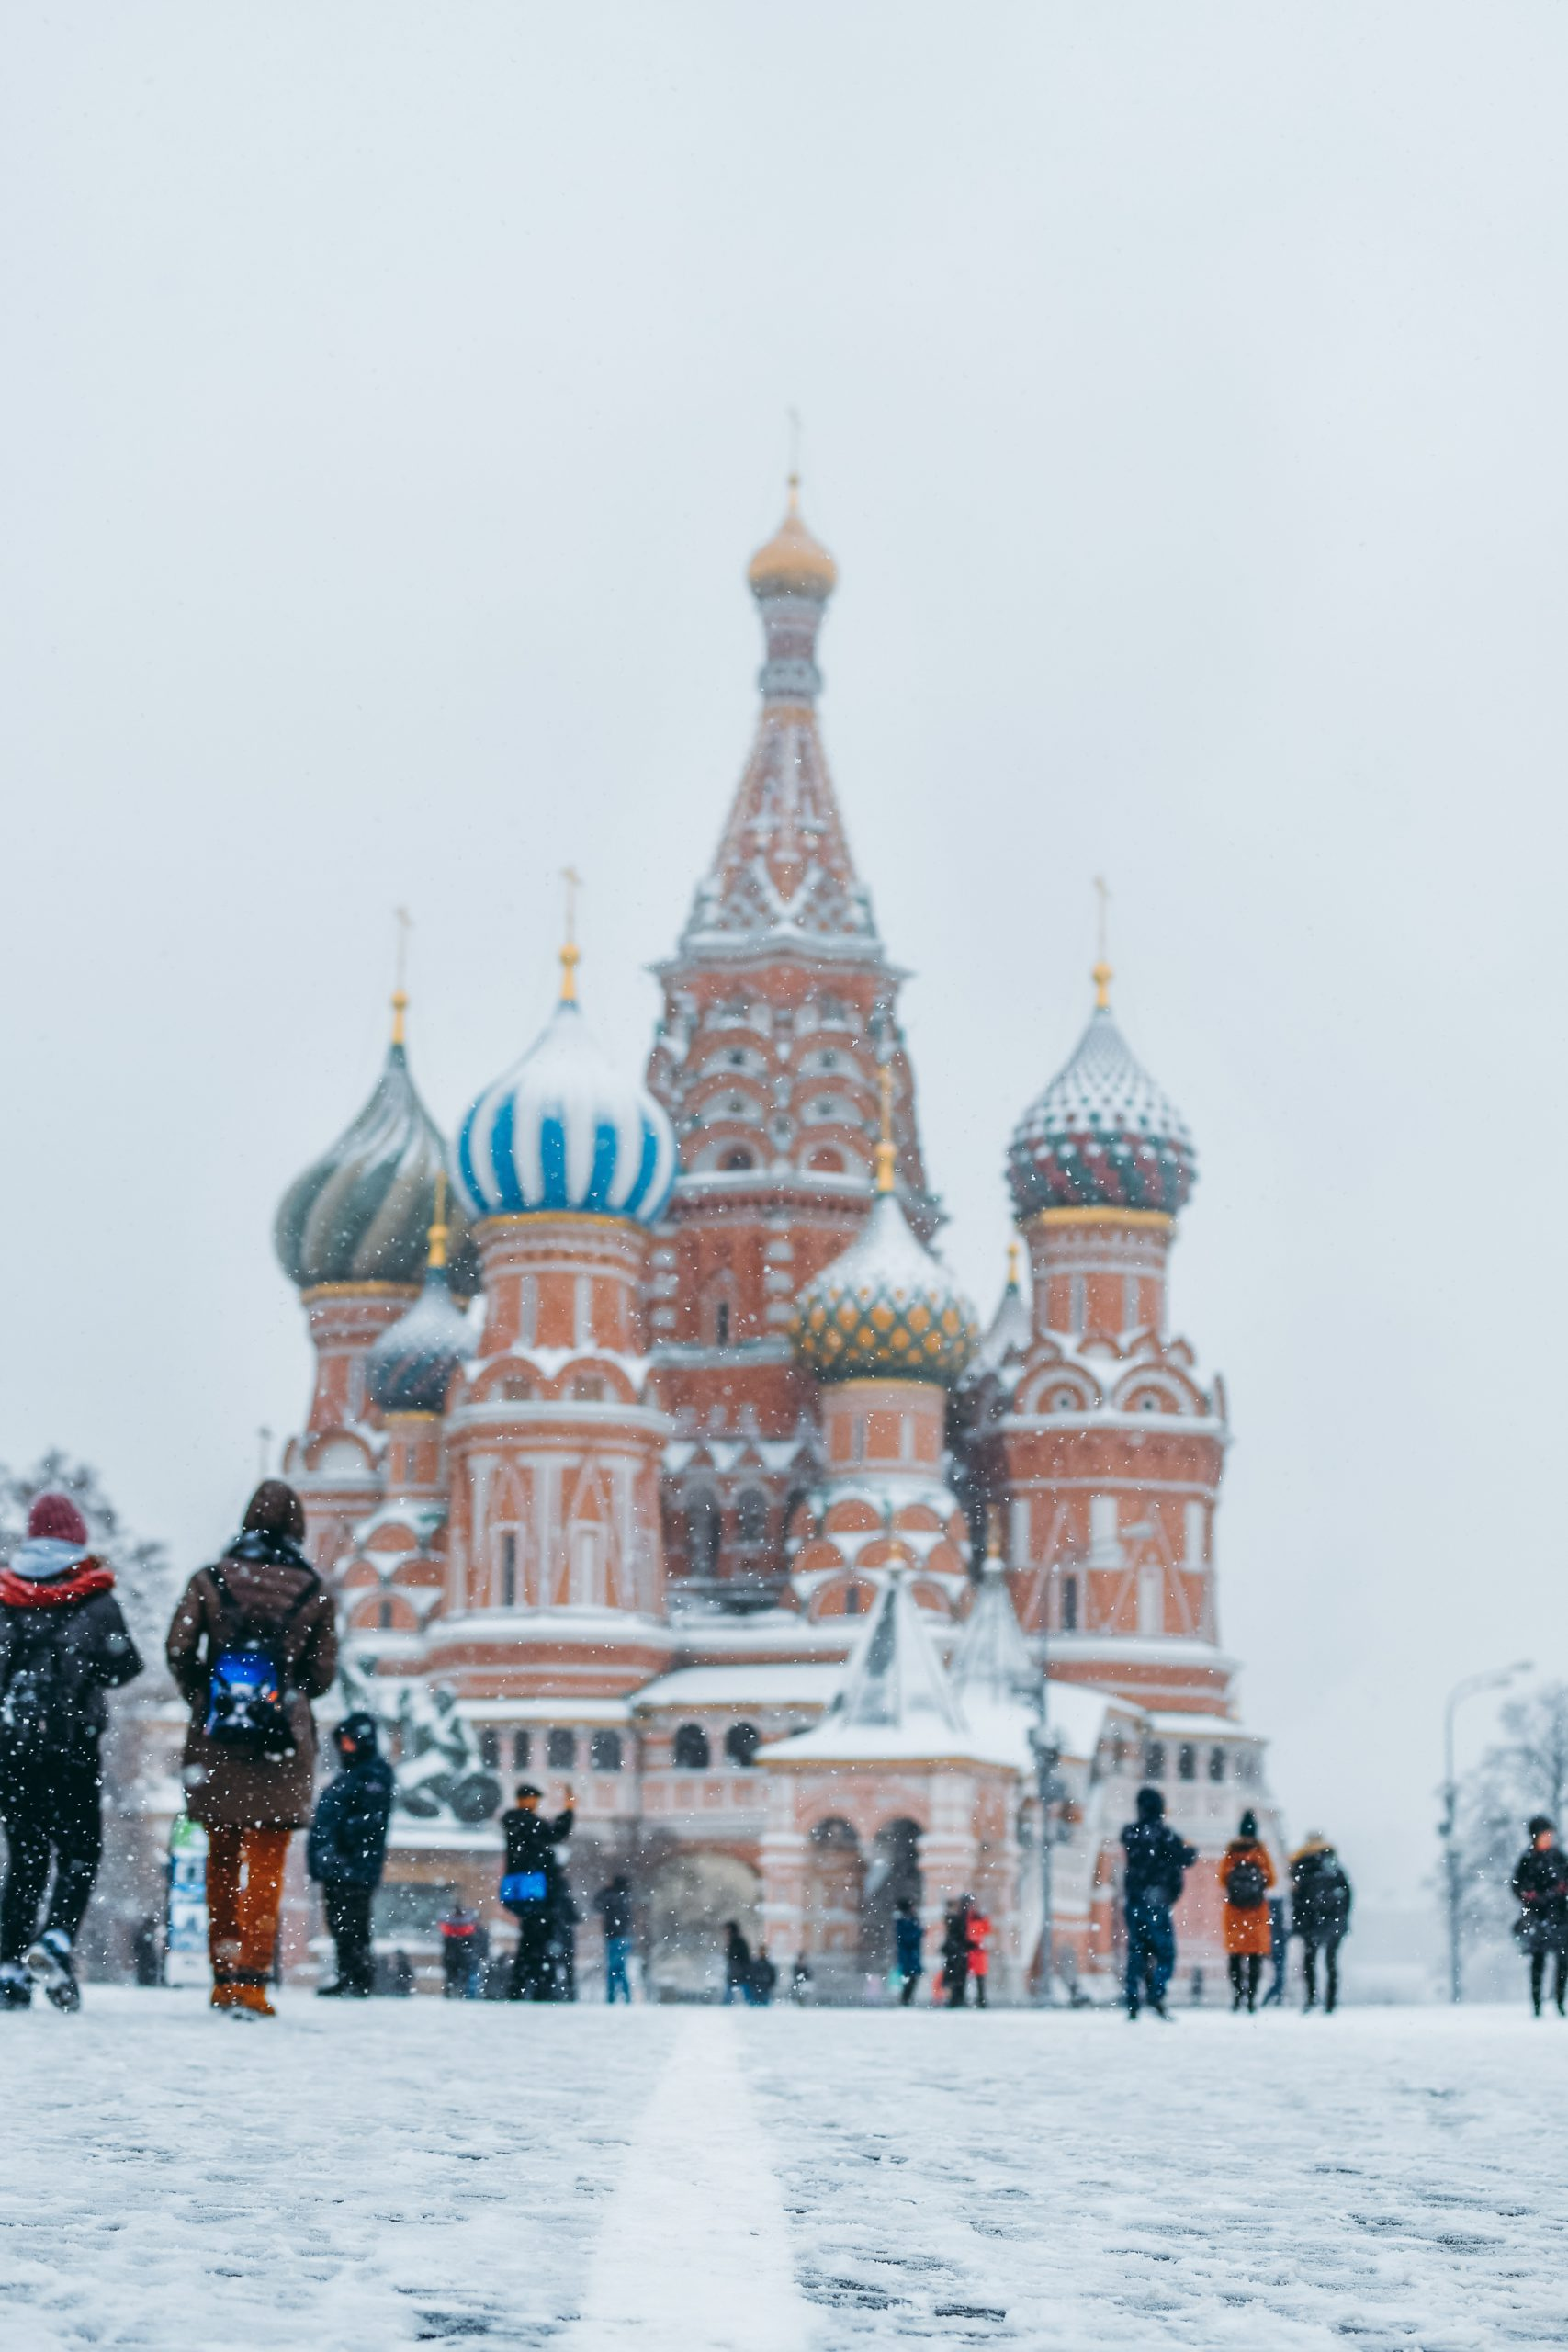 30 enero 2019 – Russian Red